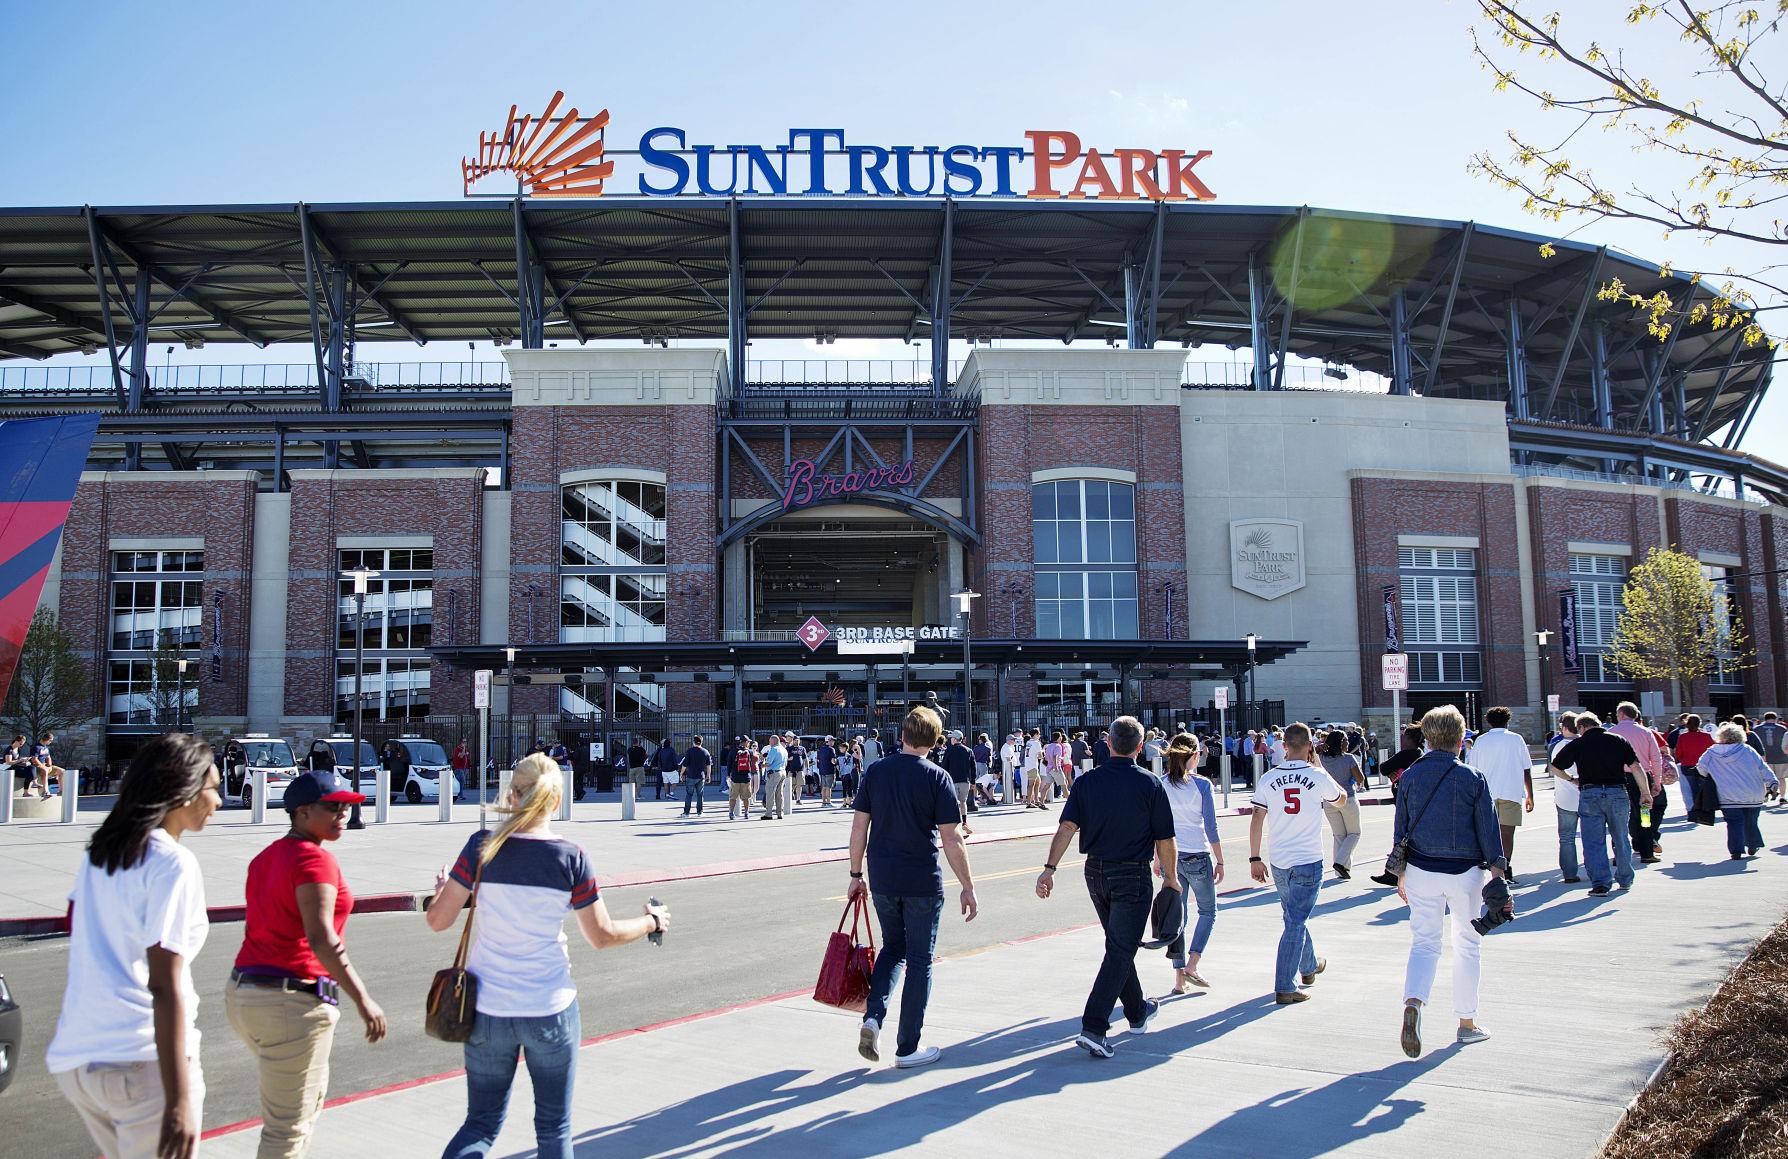 Braves beat Padres 5-2 on opening night at new stadium